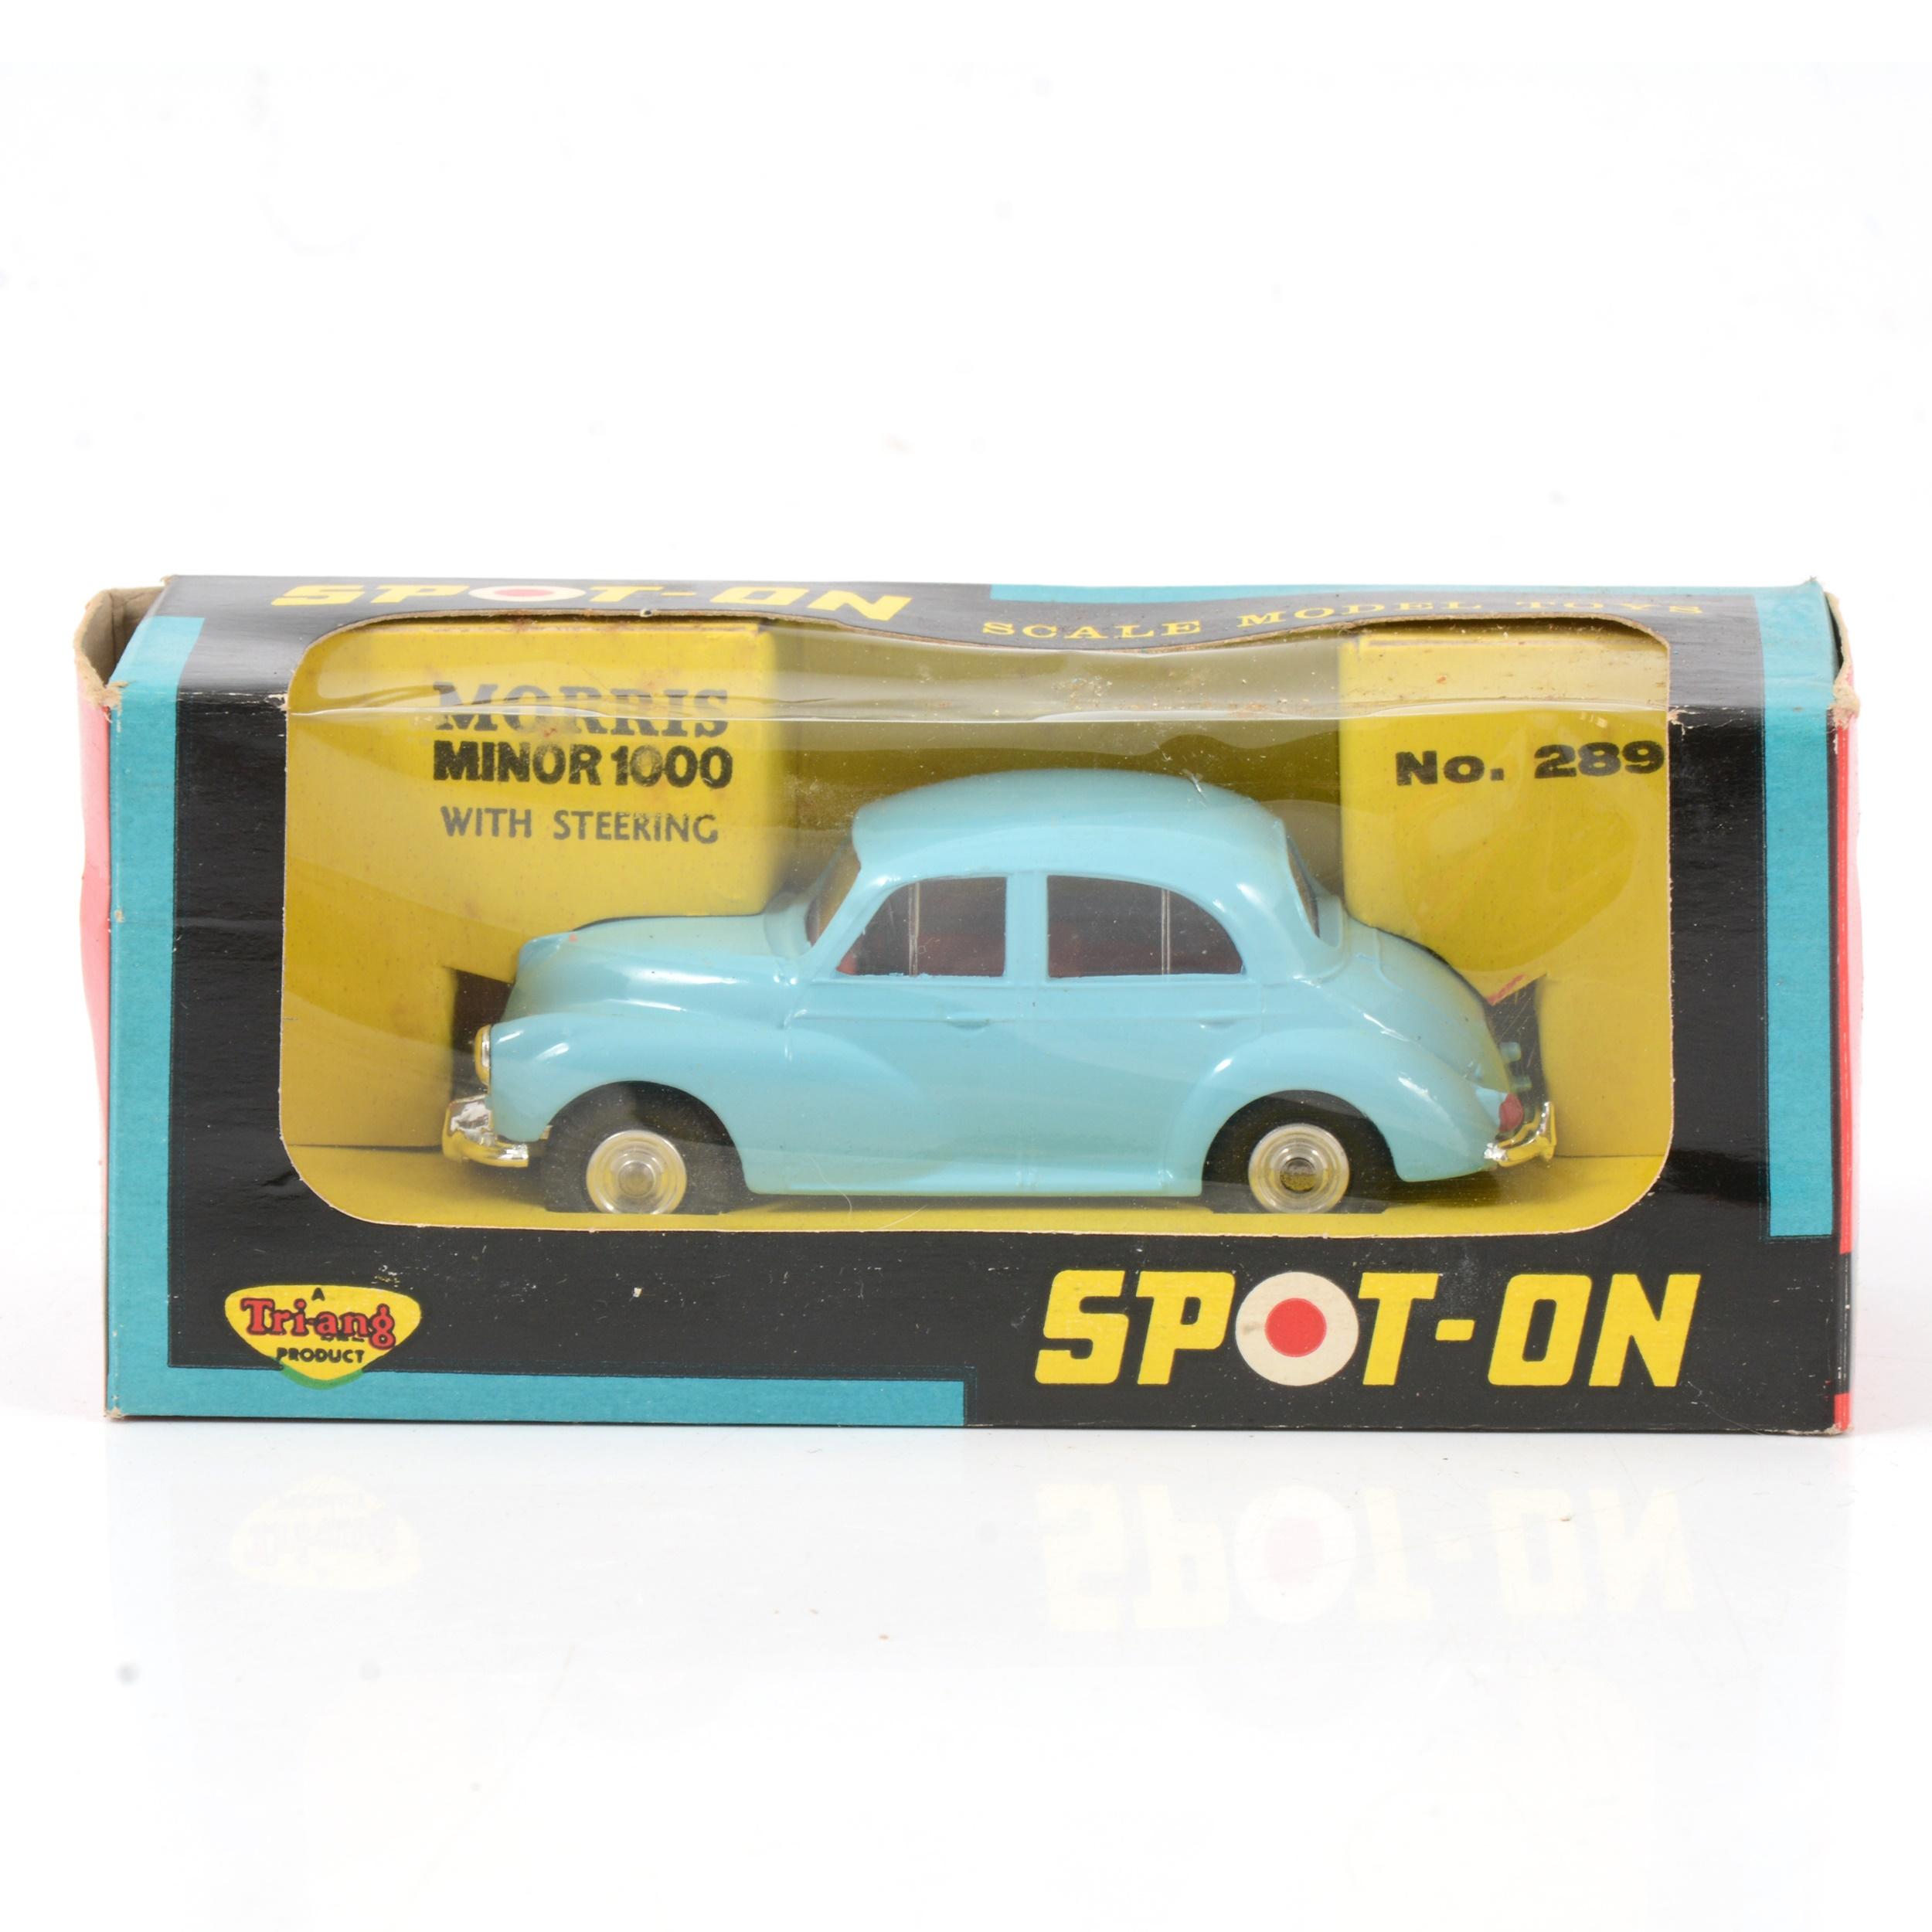 Tri-ang Spot-on die-cast model 289 Morris Minor 1000.